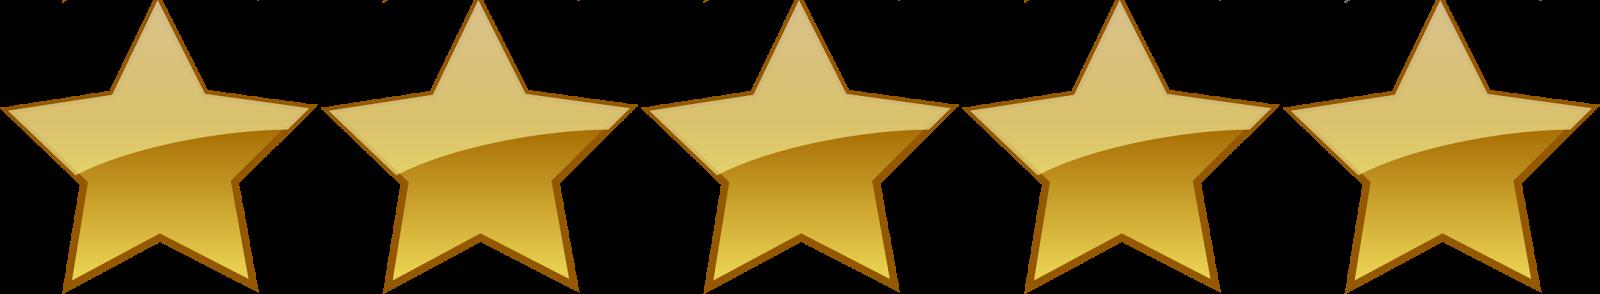 Five star rating clipart picture transparent The Book Magnet | Faith Hogan picture transparent